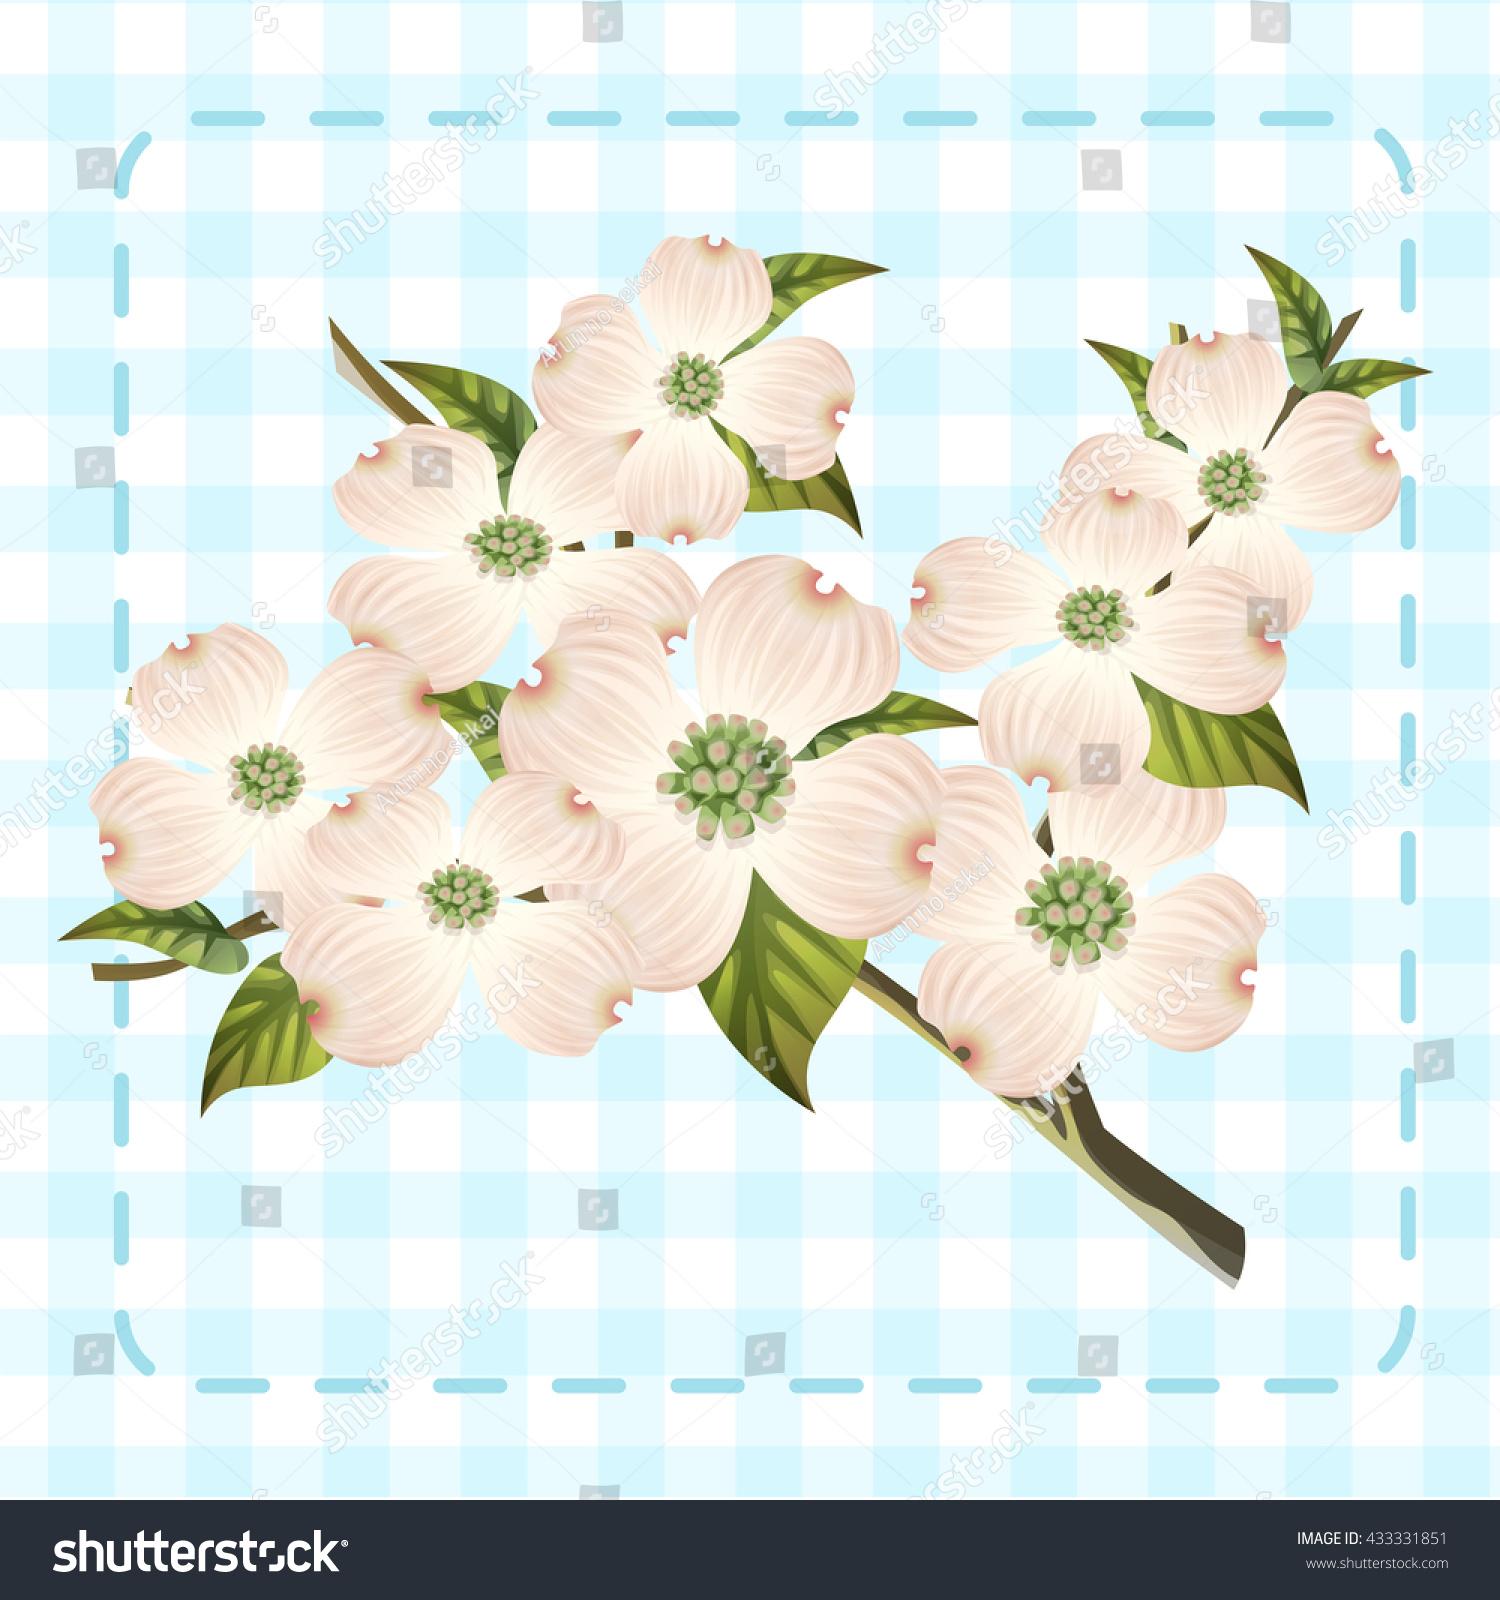 White Dogwood Cornus Hanamizuki Flower Illustration Stock Vector ...